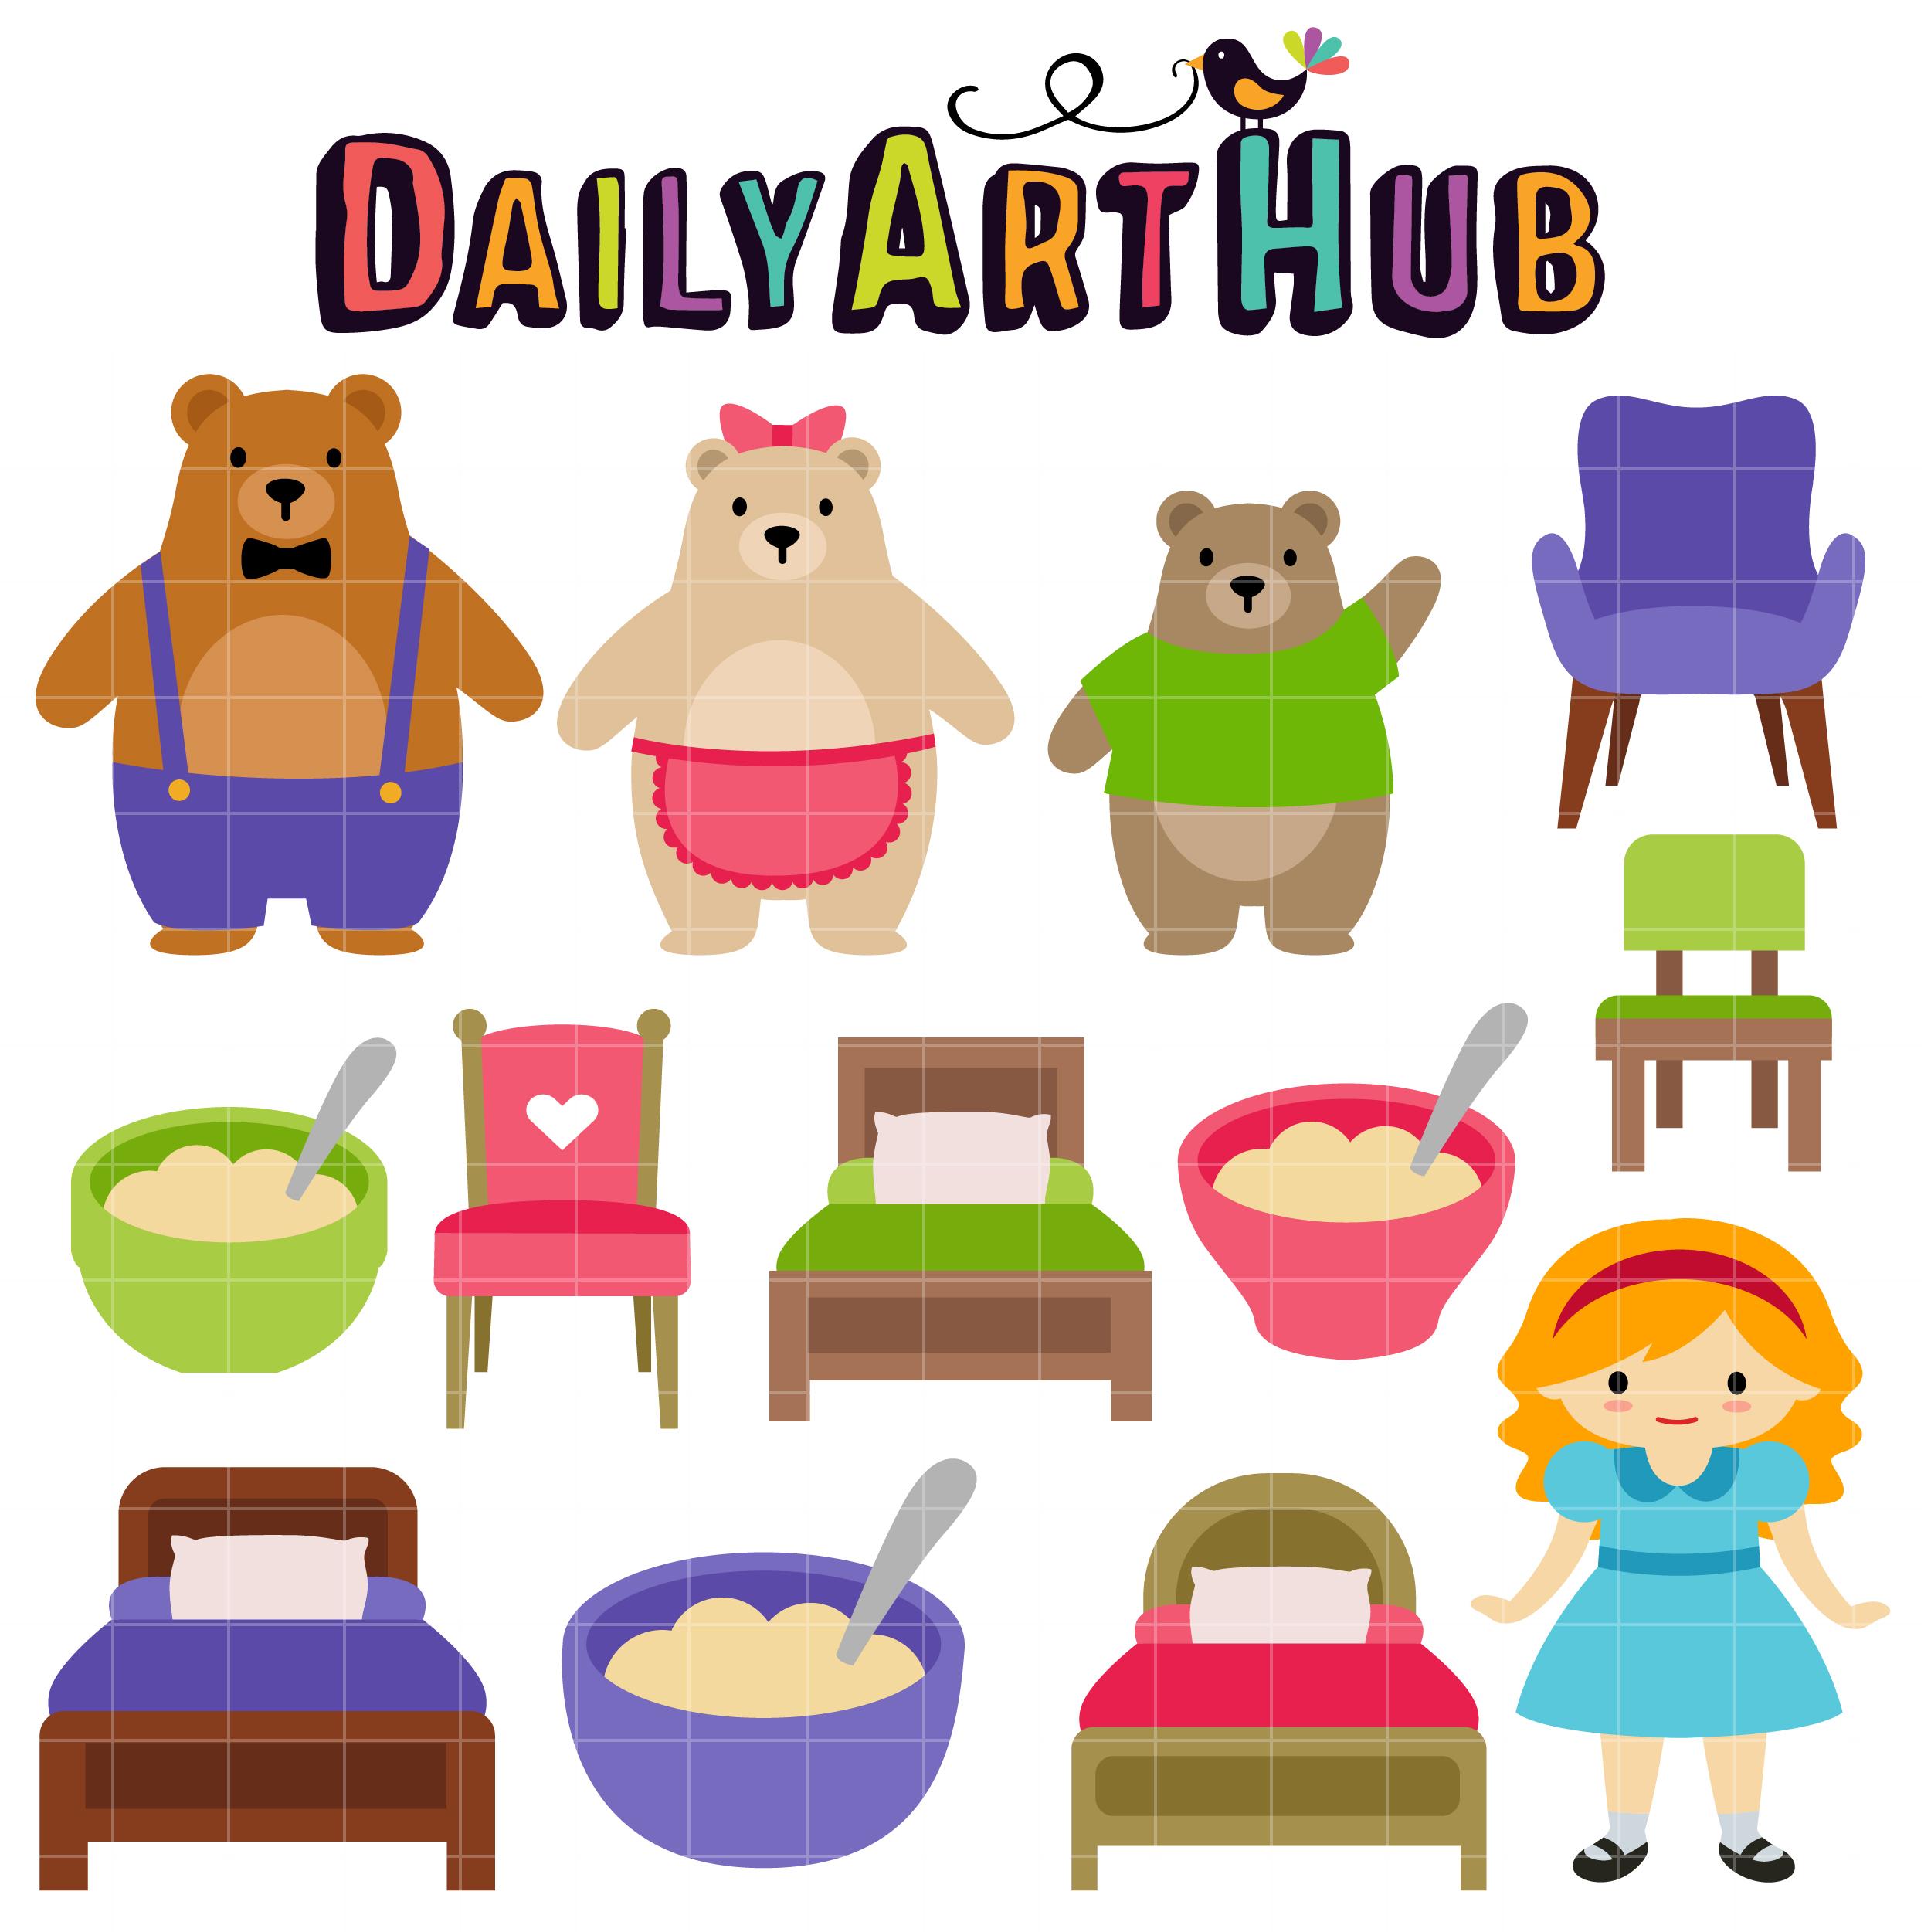 Goldilocks And The Three Bear Clip Art Set Daily Art Hub Free Clip Art Everyday